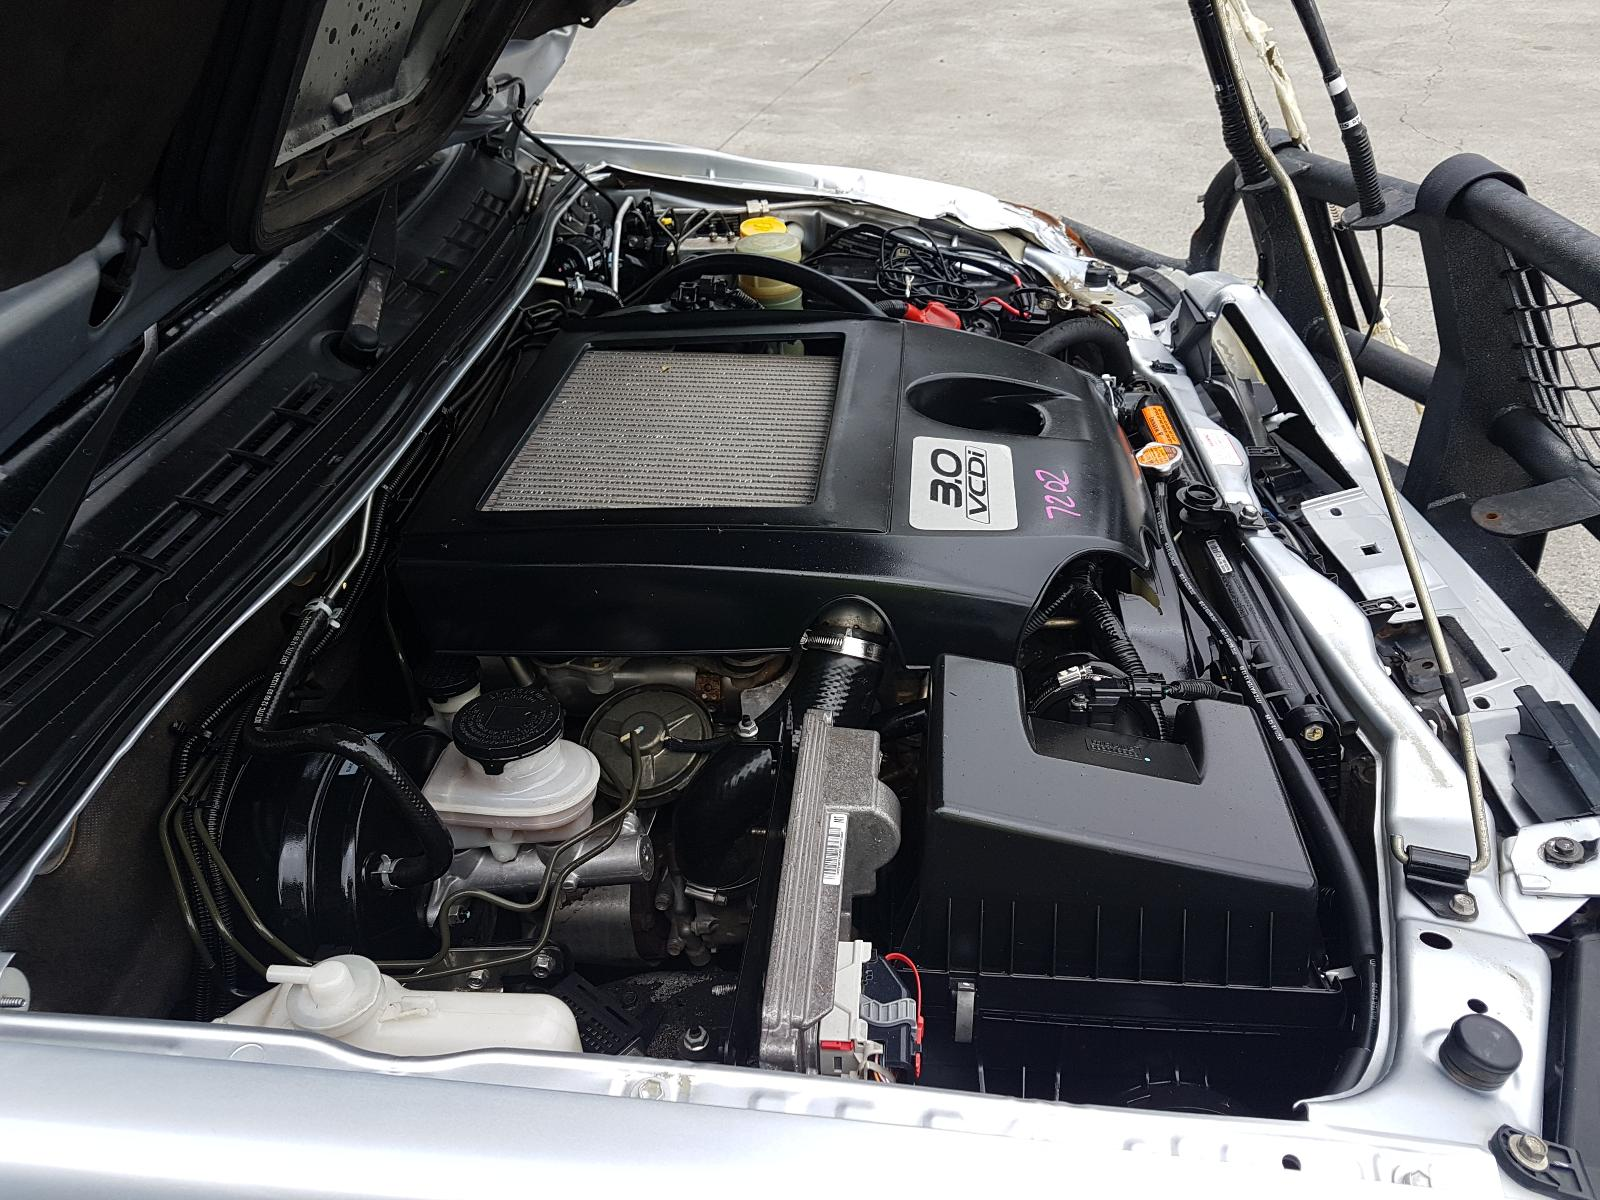 View Auto part Misc Holden Colorado 2010